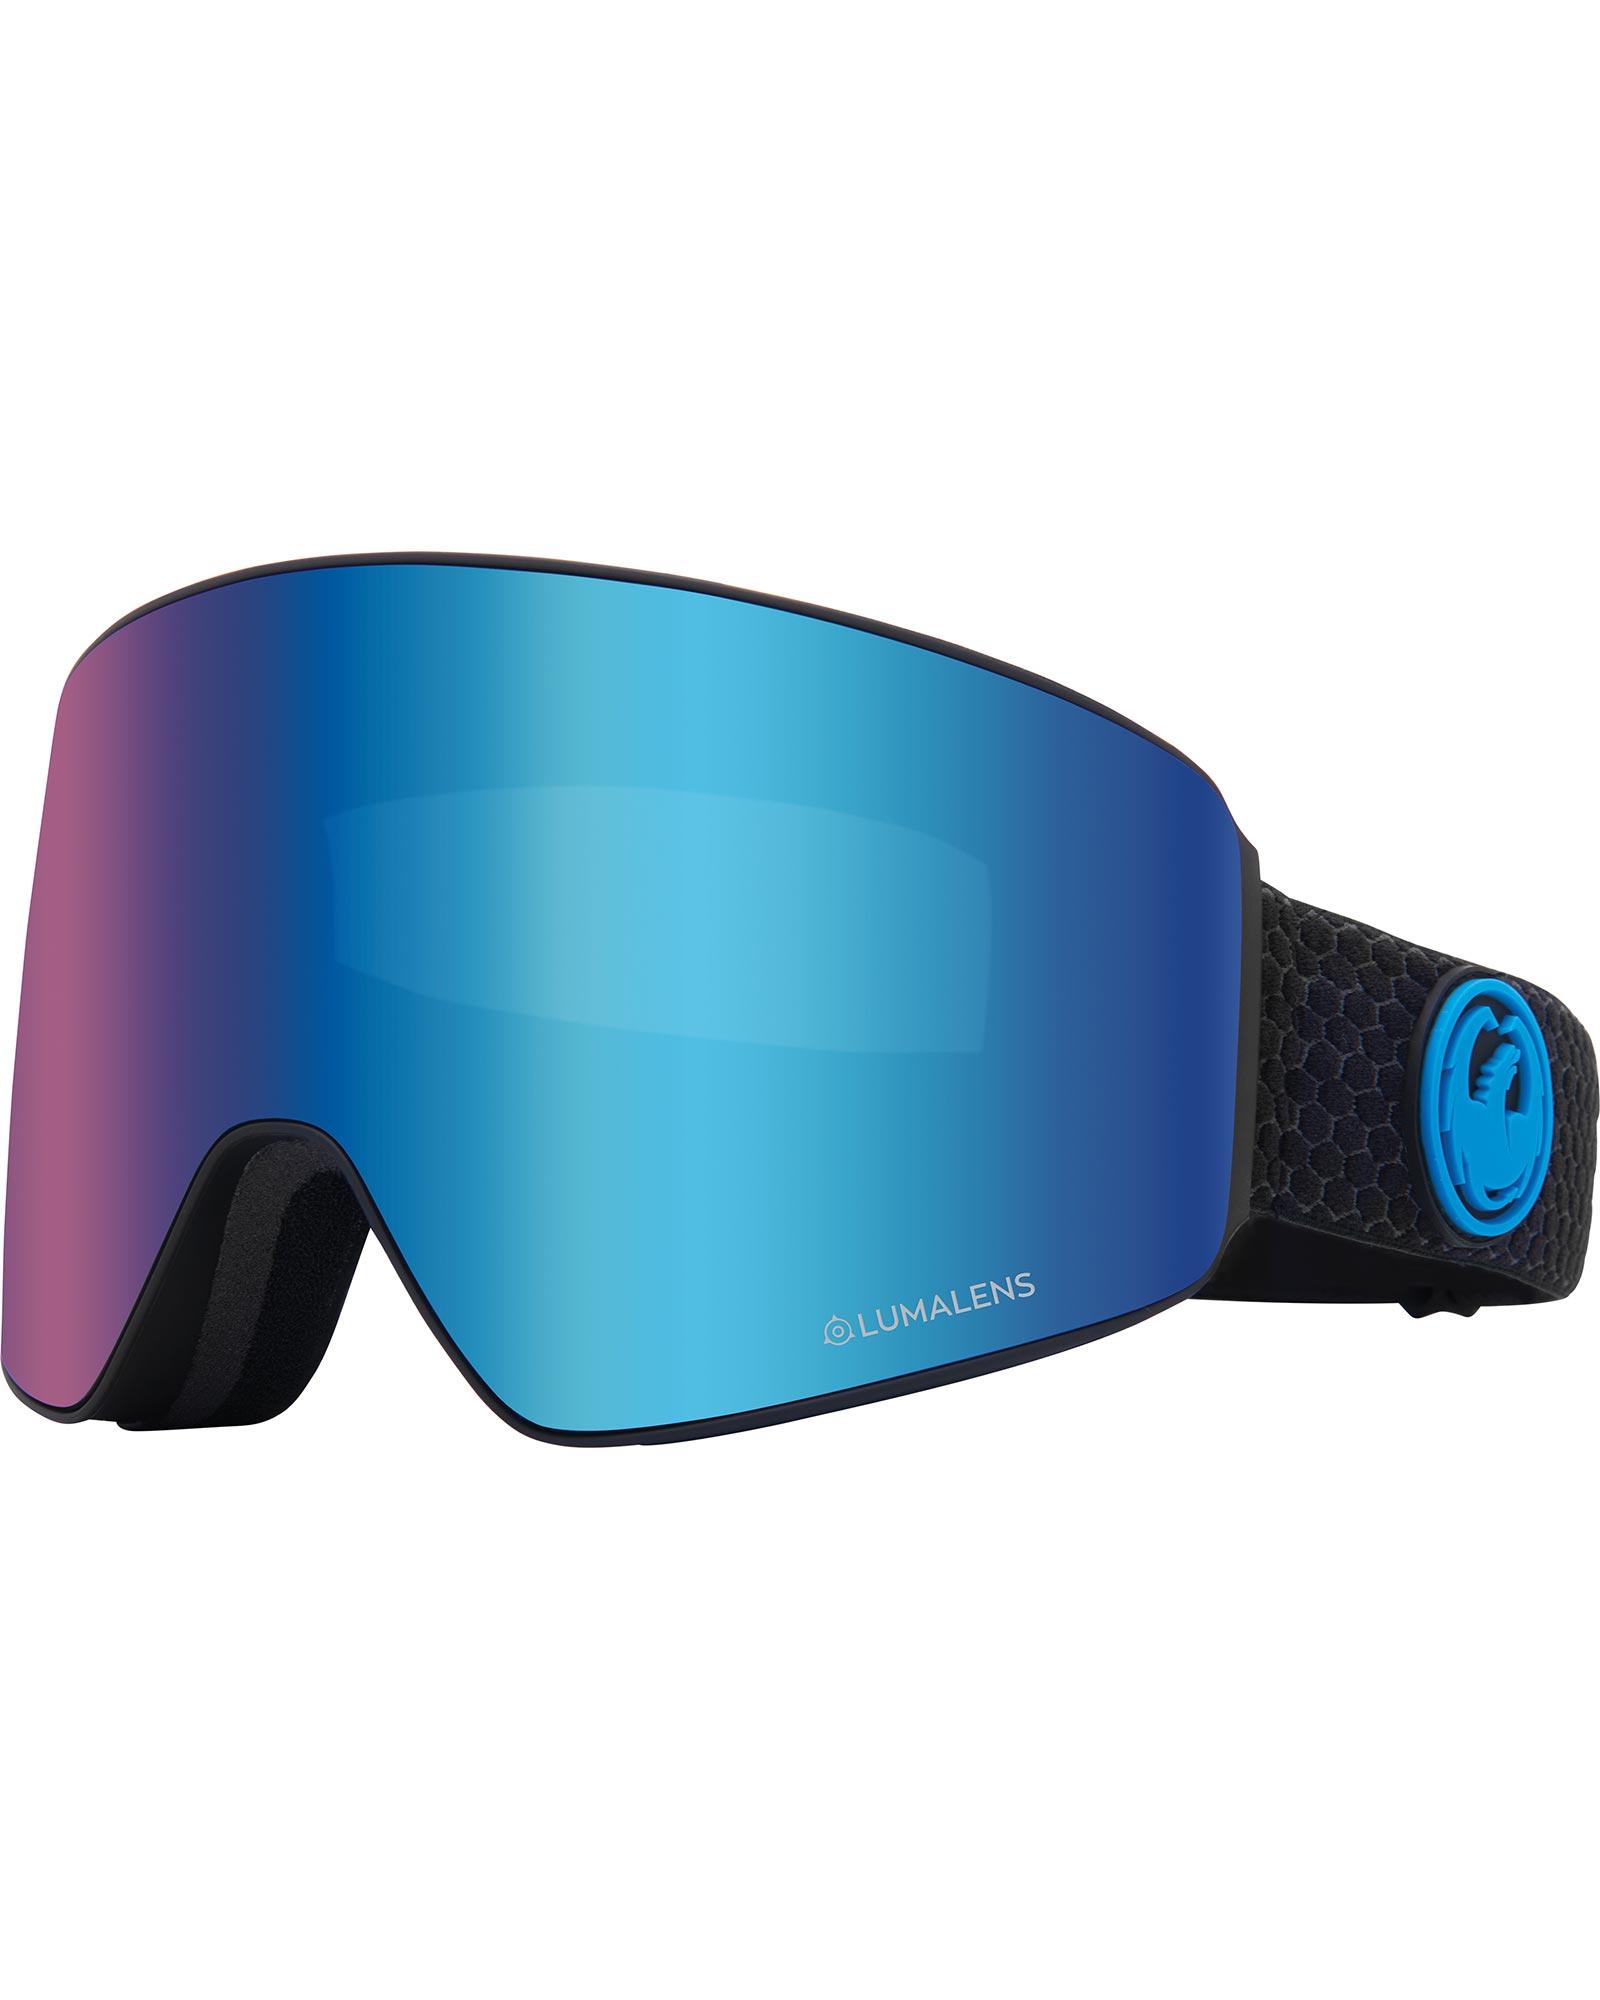 Dragon PXV Split / Lumalens Blue Ionized + Lumalens Amber Goggles 2019 / 2020 0